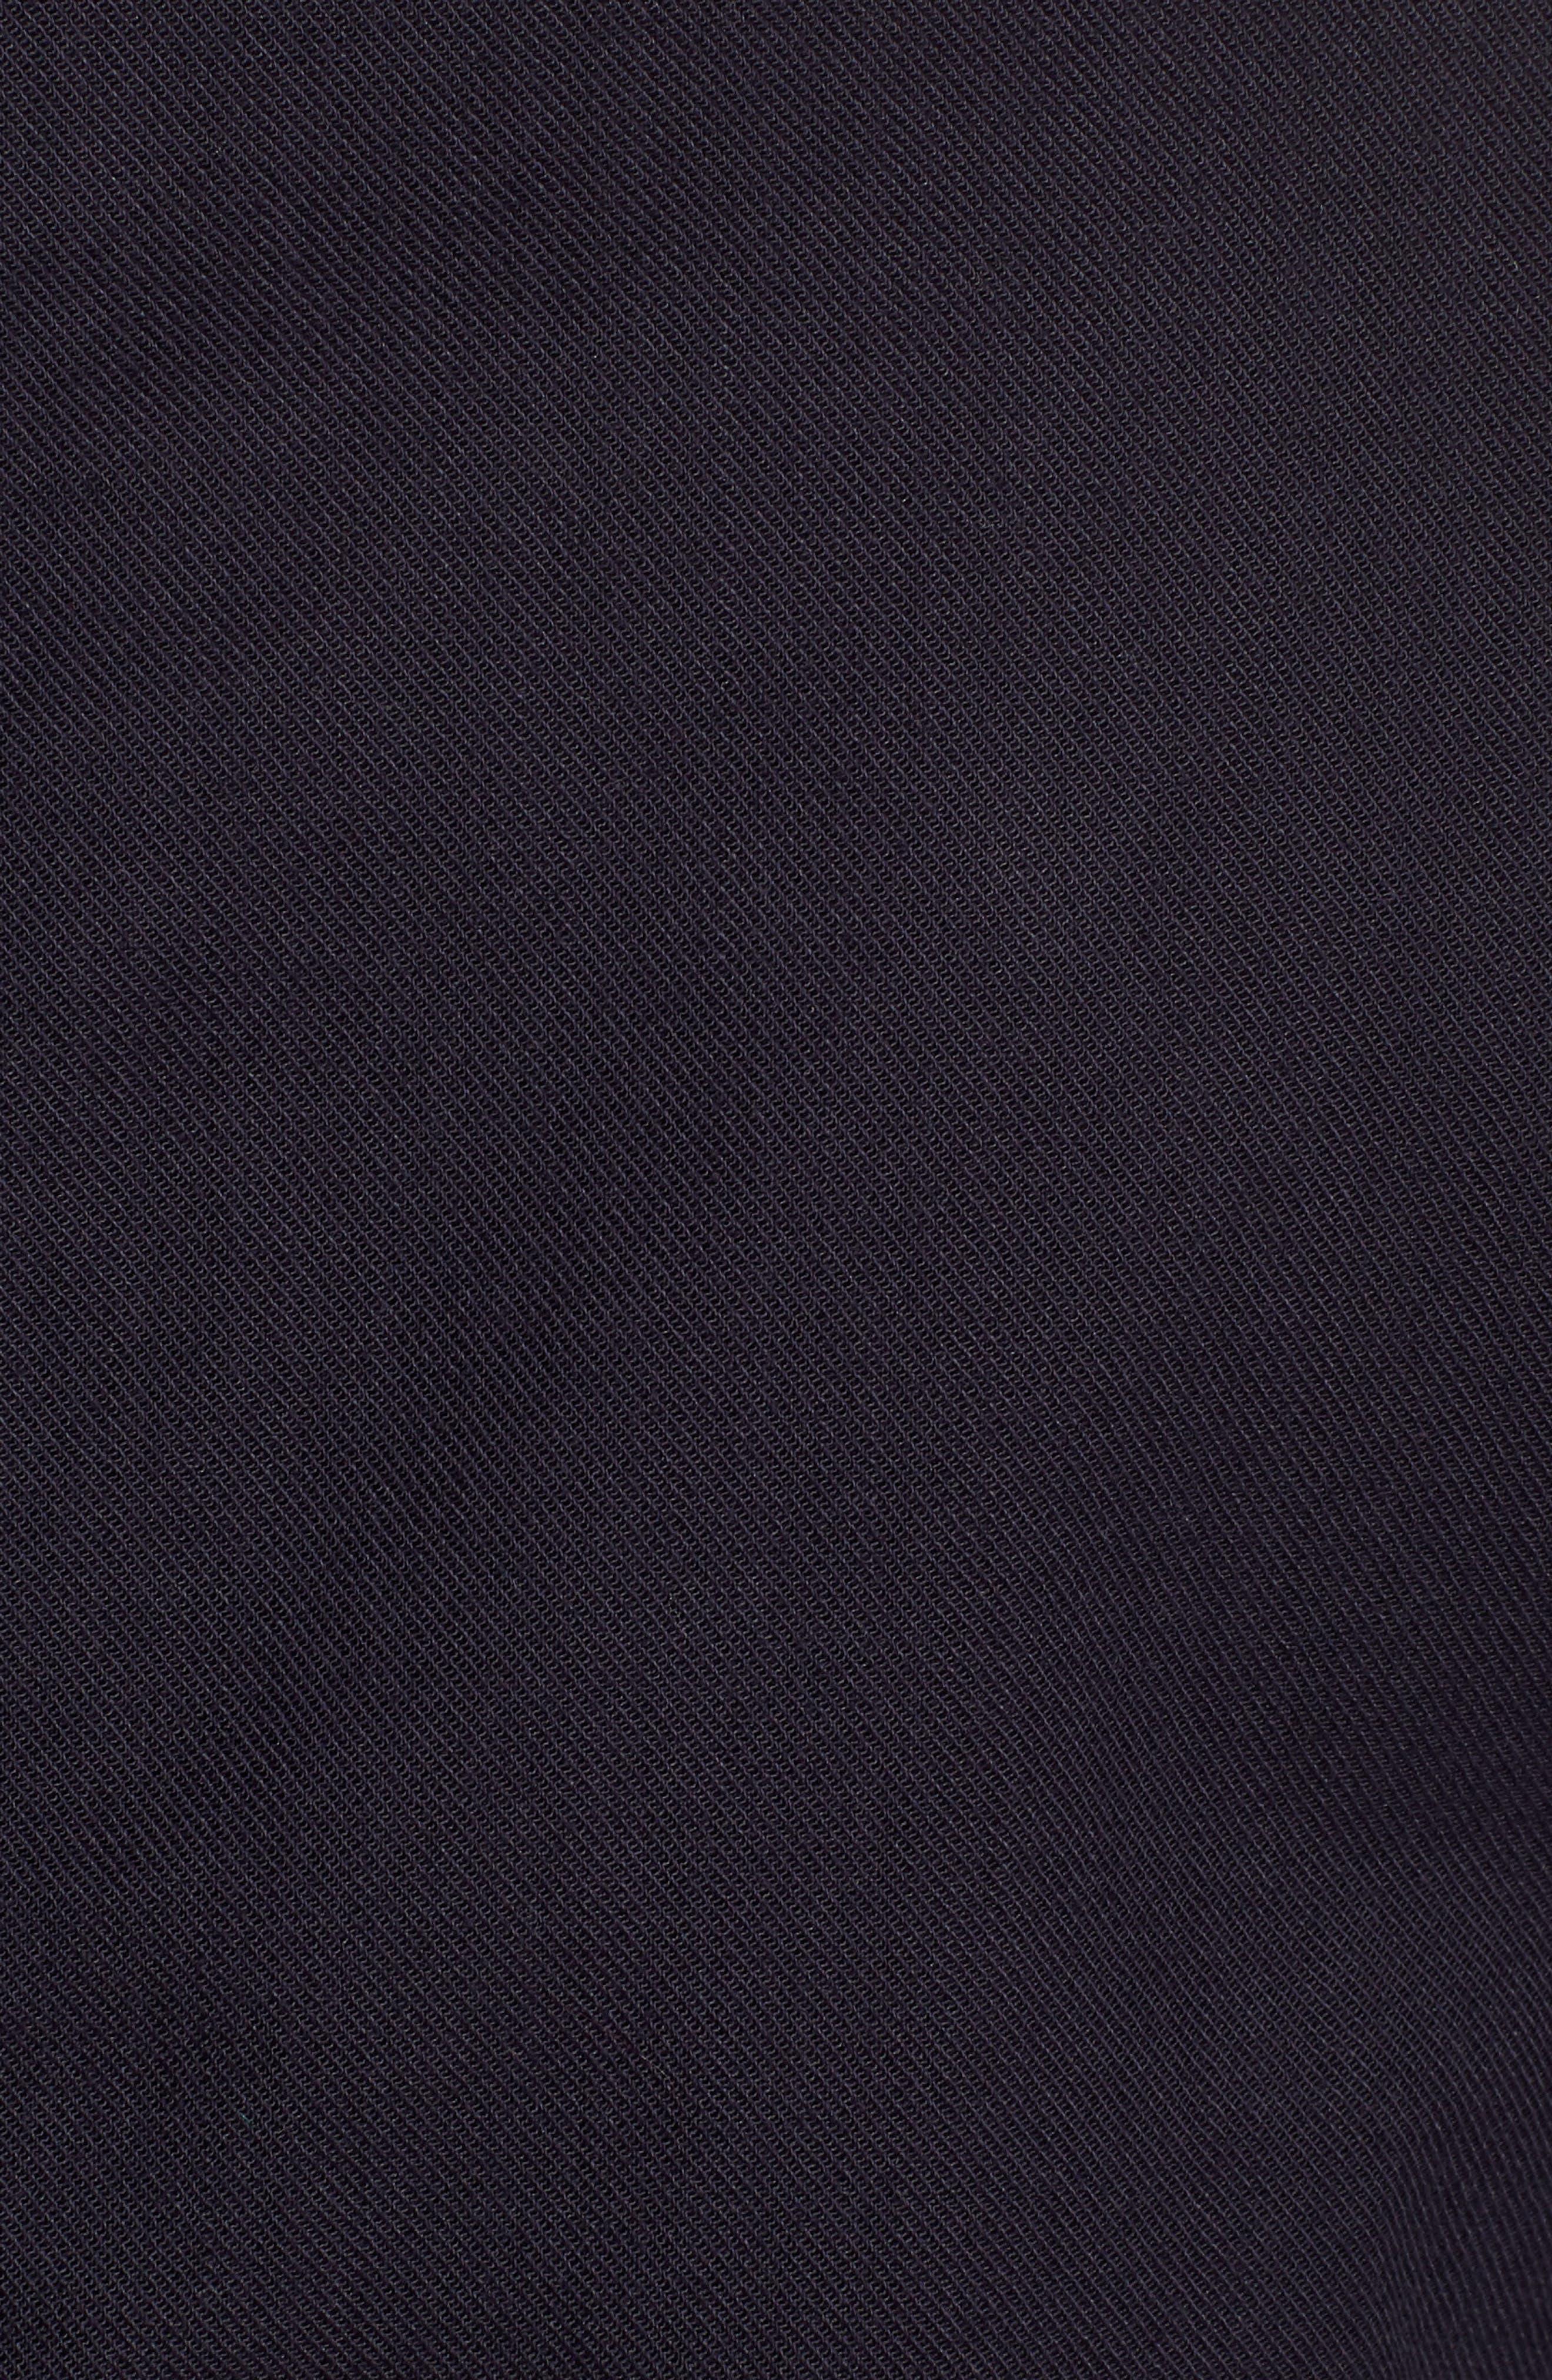 Slim Fit Slub Twill Cotton & Linen Jacket,                             Alternate thumbnail 6, color,                             001